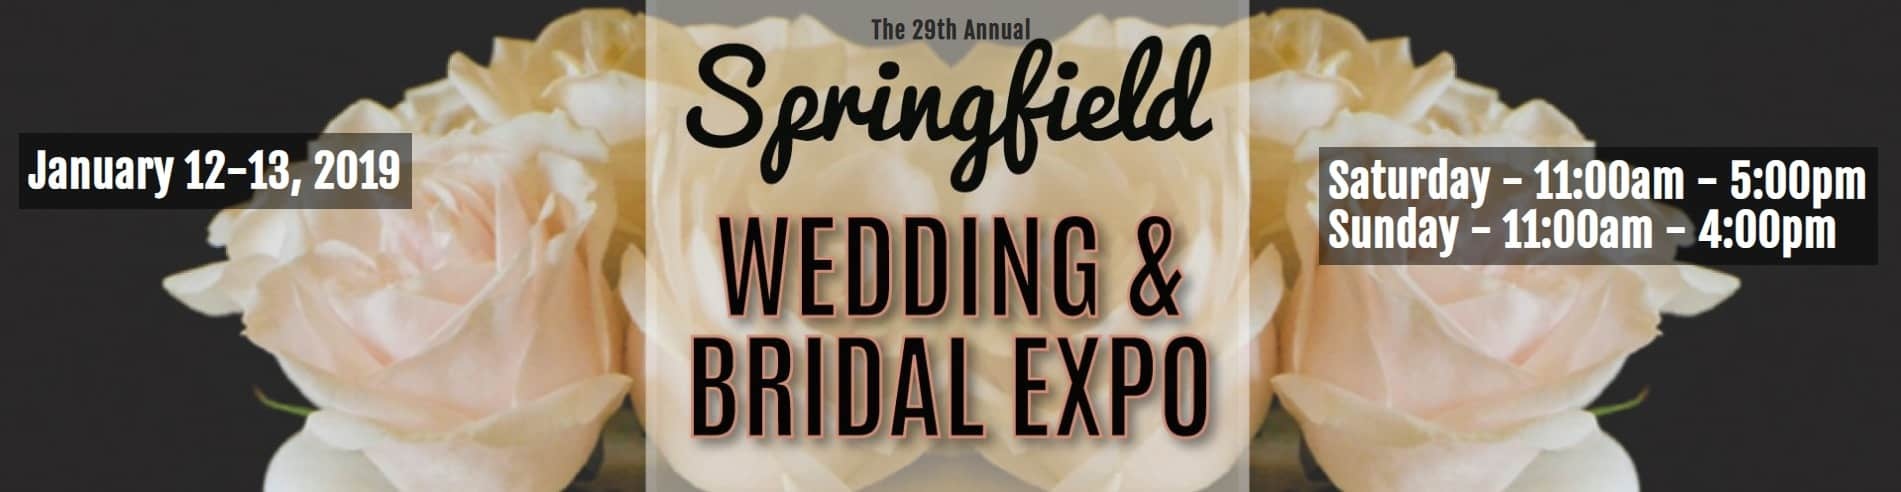 2020 Springfield Wedding & Bridal Expo   Jenks Productions